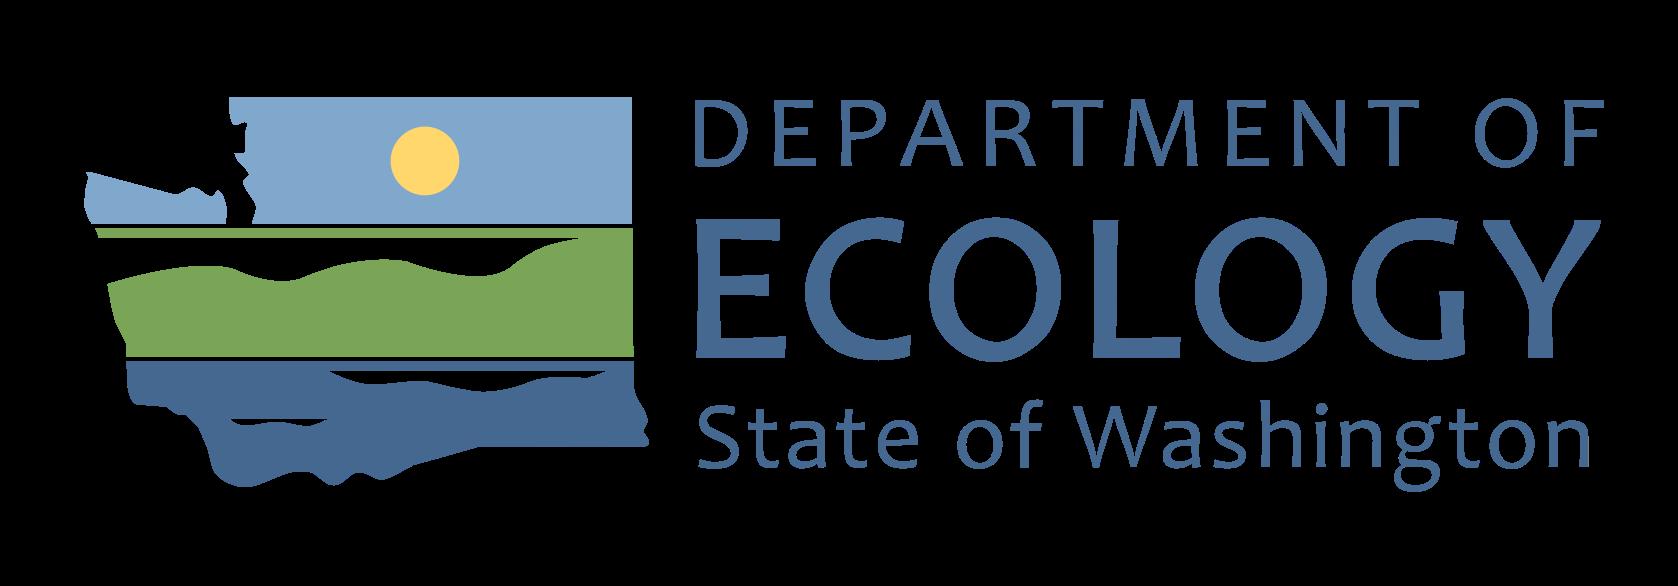 Department of Ecology: State of Washington